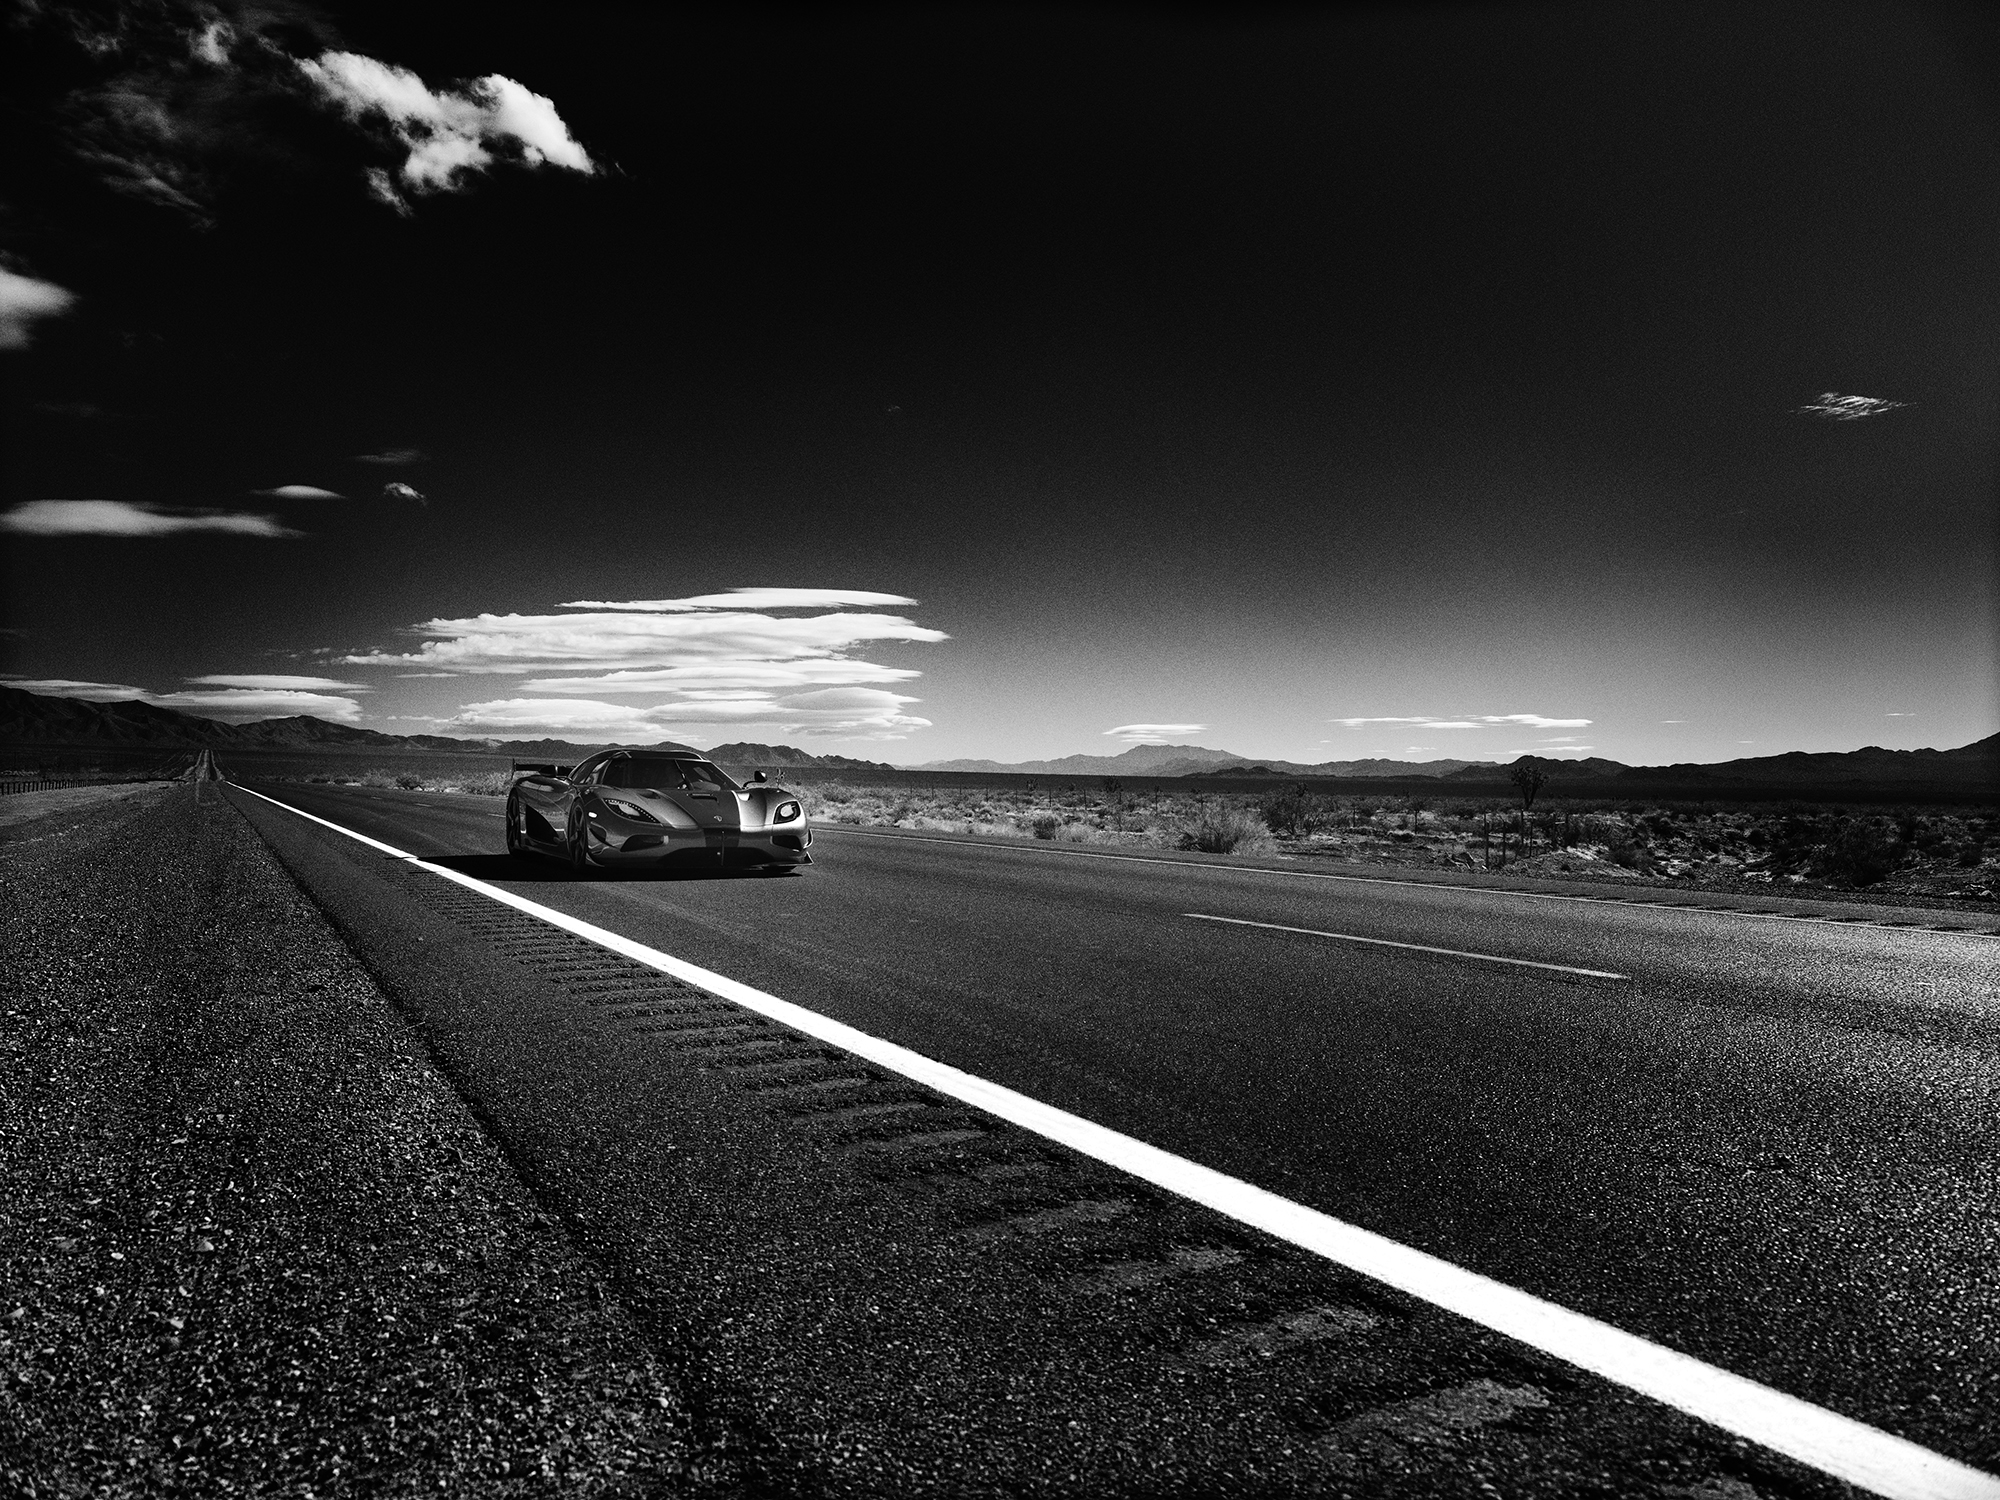 Location:  Nevada desert Camera: Hasselblad H6D-100c Shutter speed: 1/350 sec Aperture: F/8  Focal Length: 35mm (HCD 35-90) ISO: 64